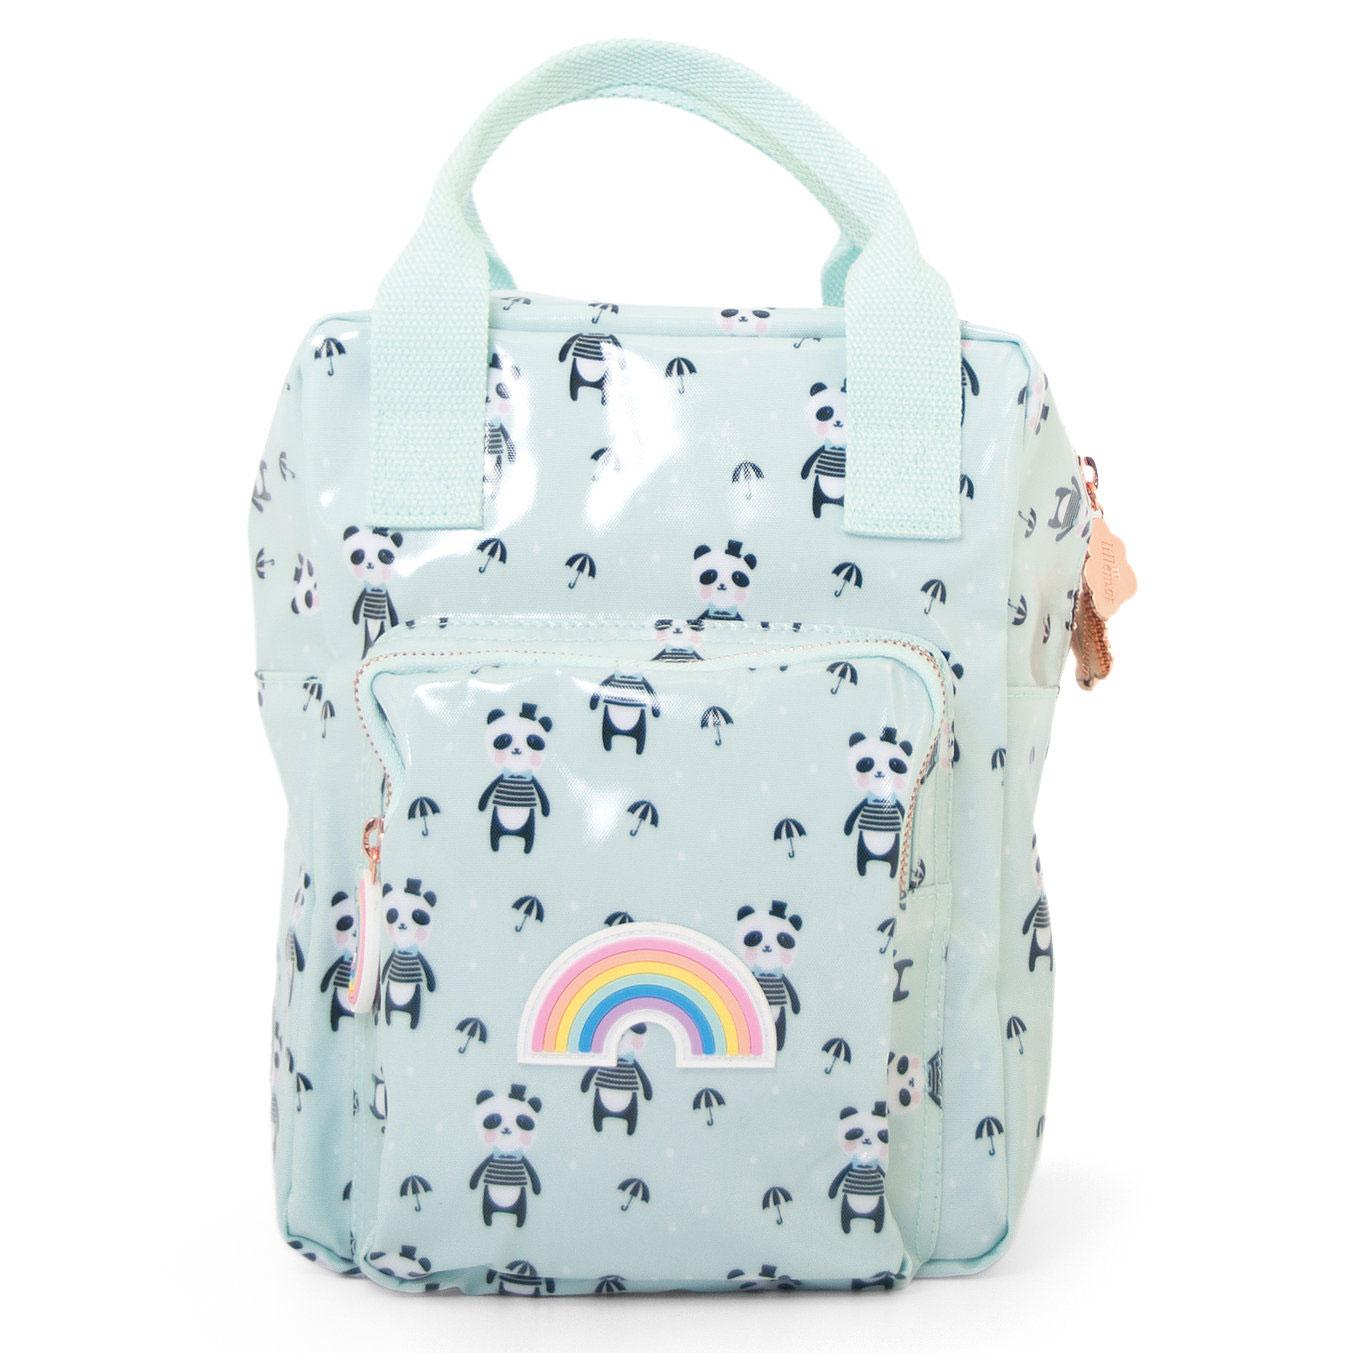 Eef Lillemor - sac à dos - Panda